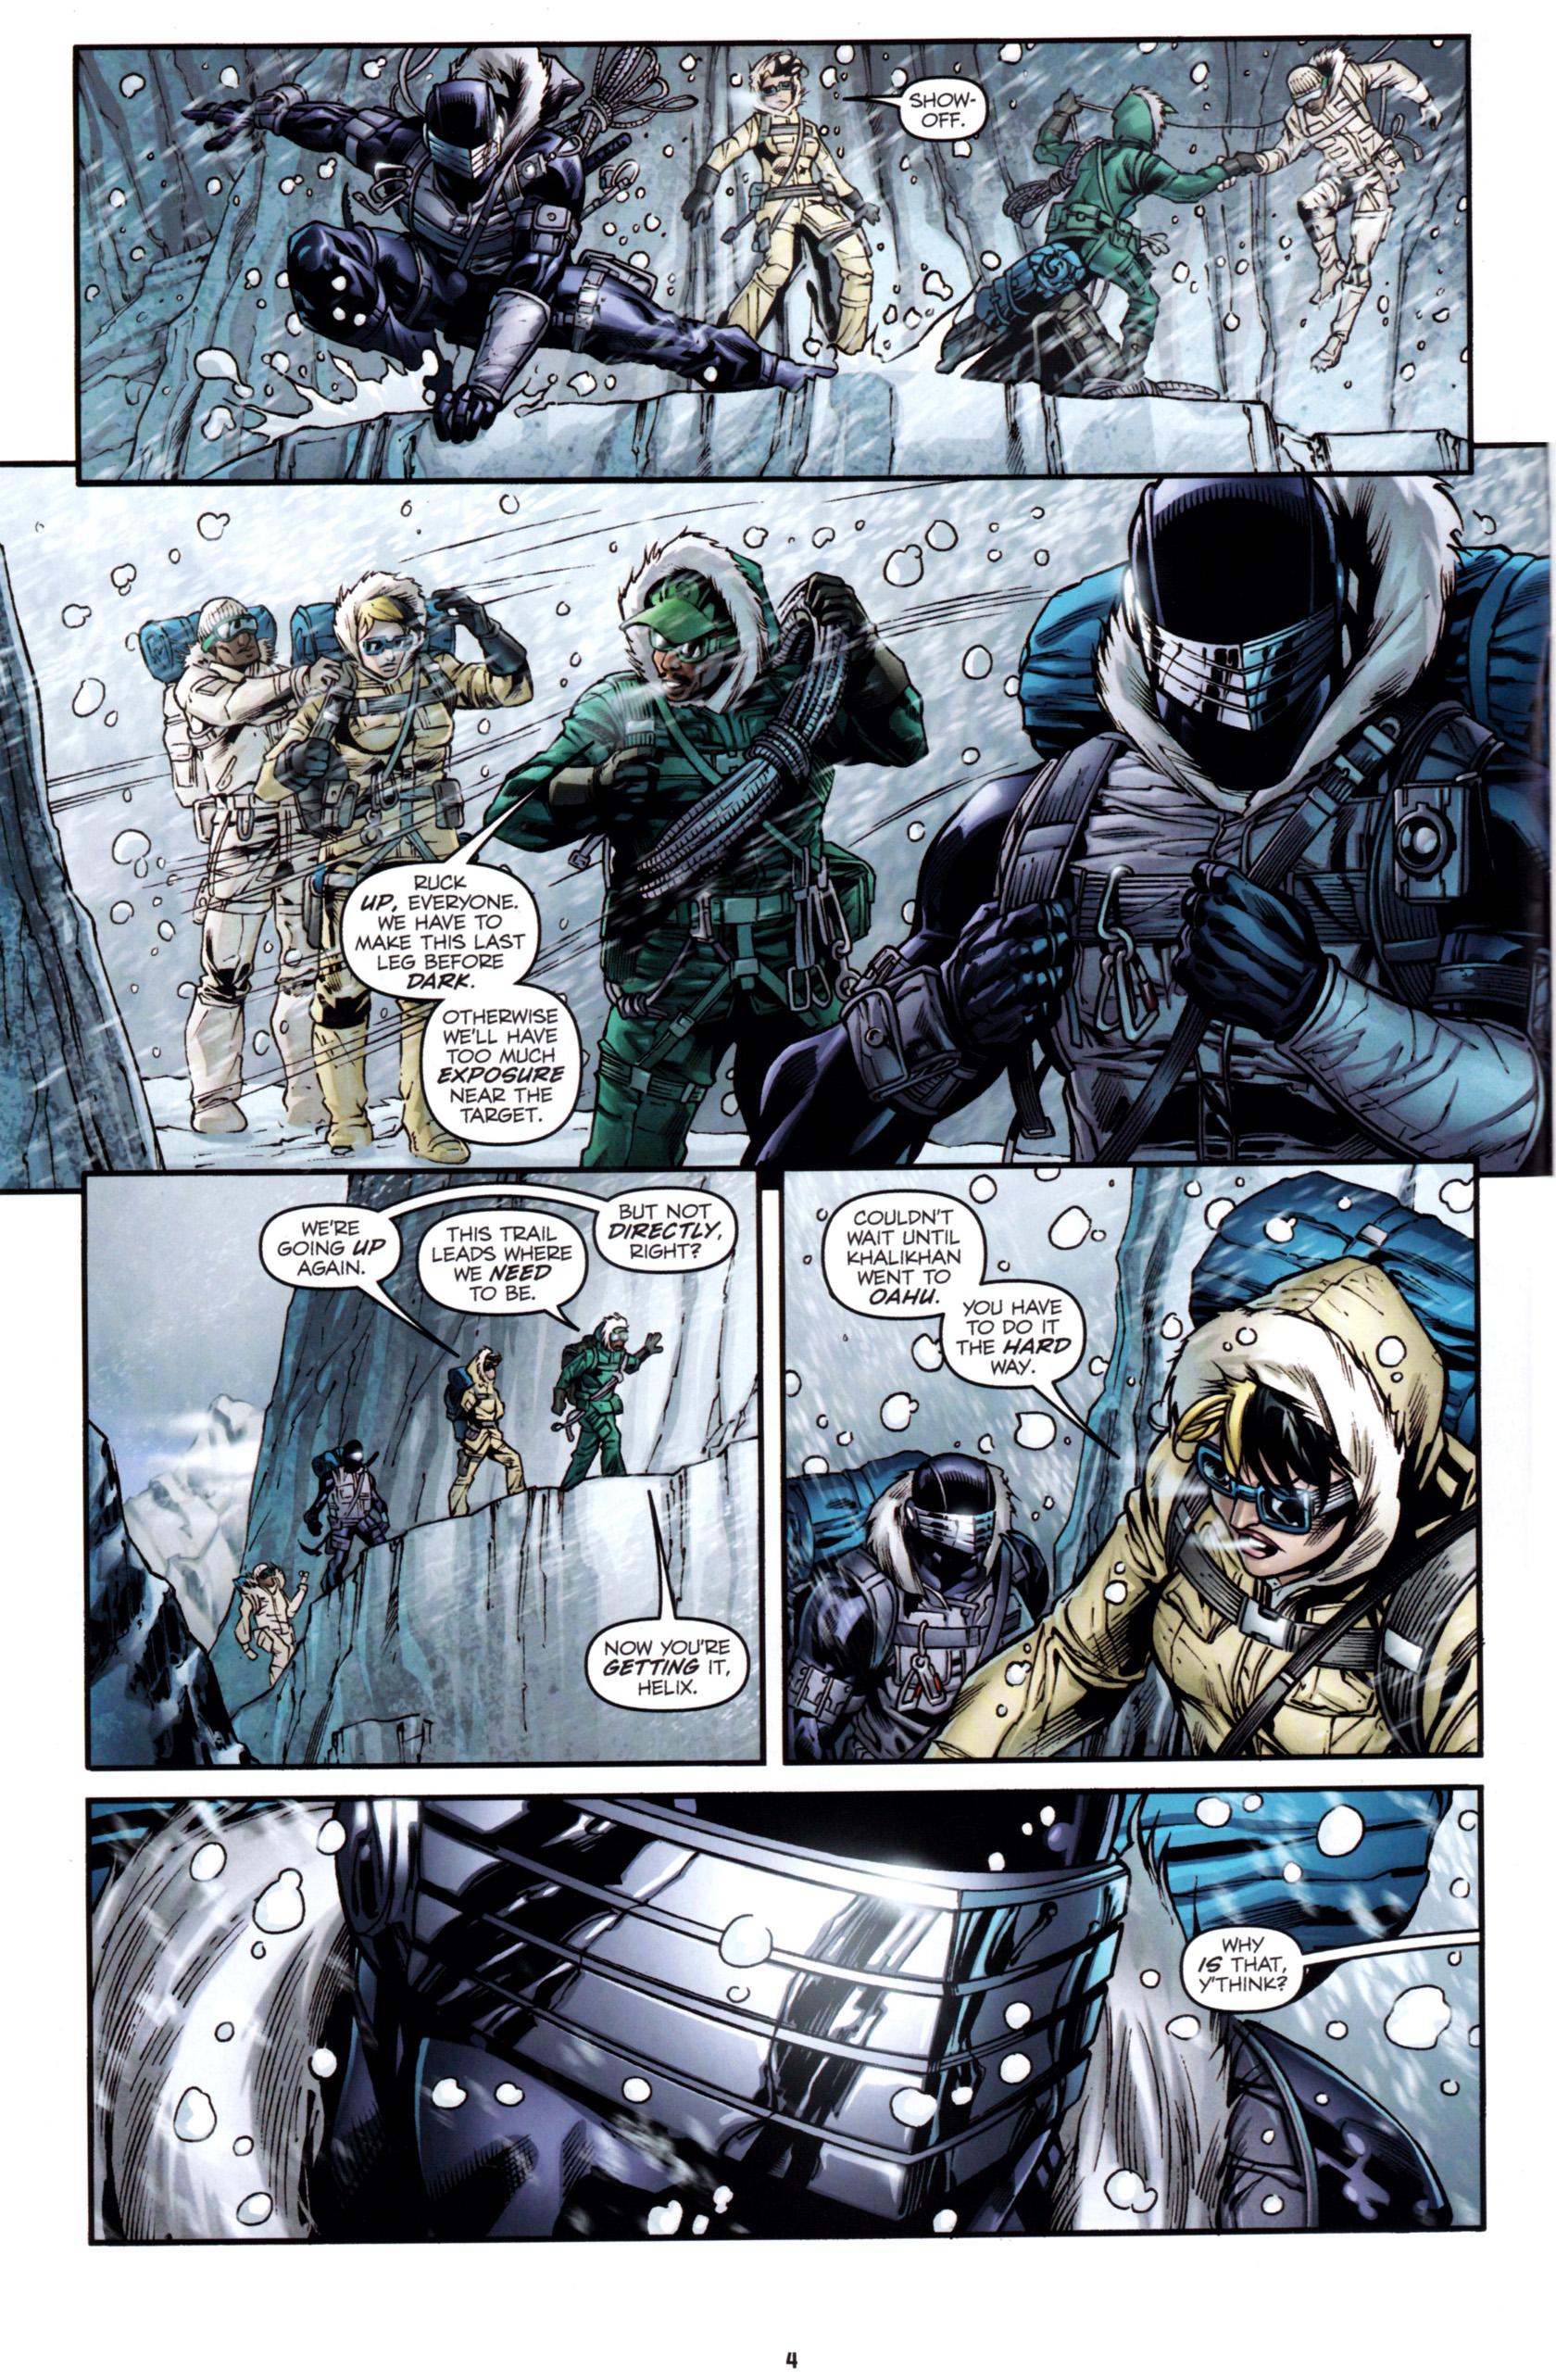 Read online G.I. Joe: Snake Eyes comic -  Issue #1 - 7